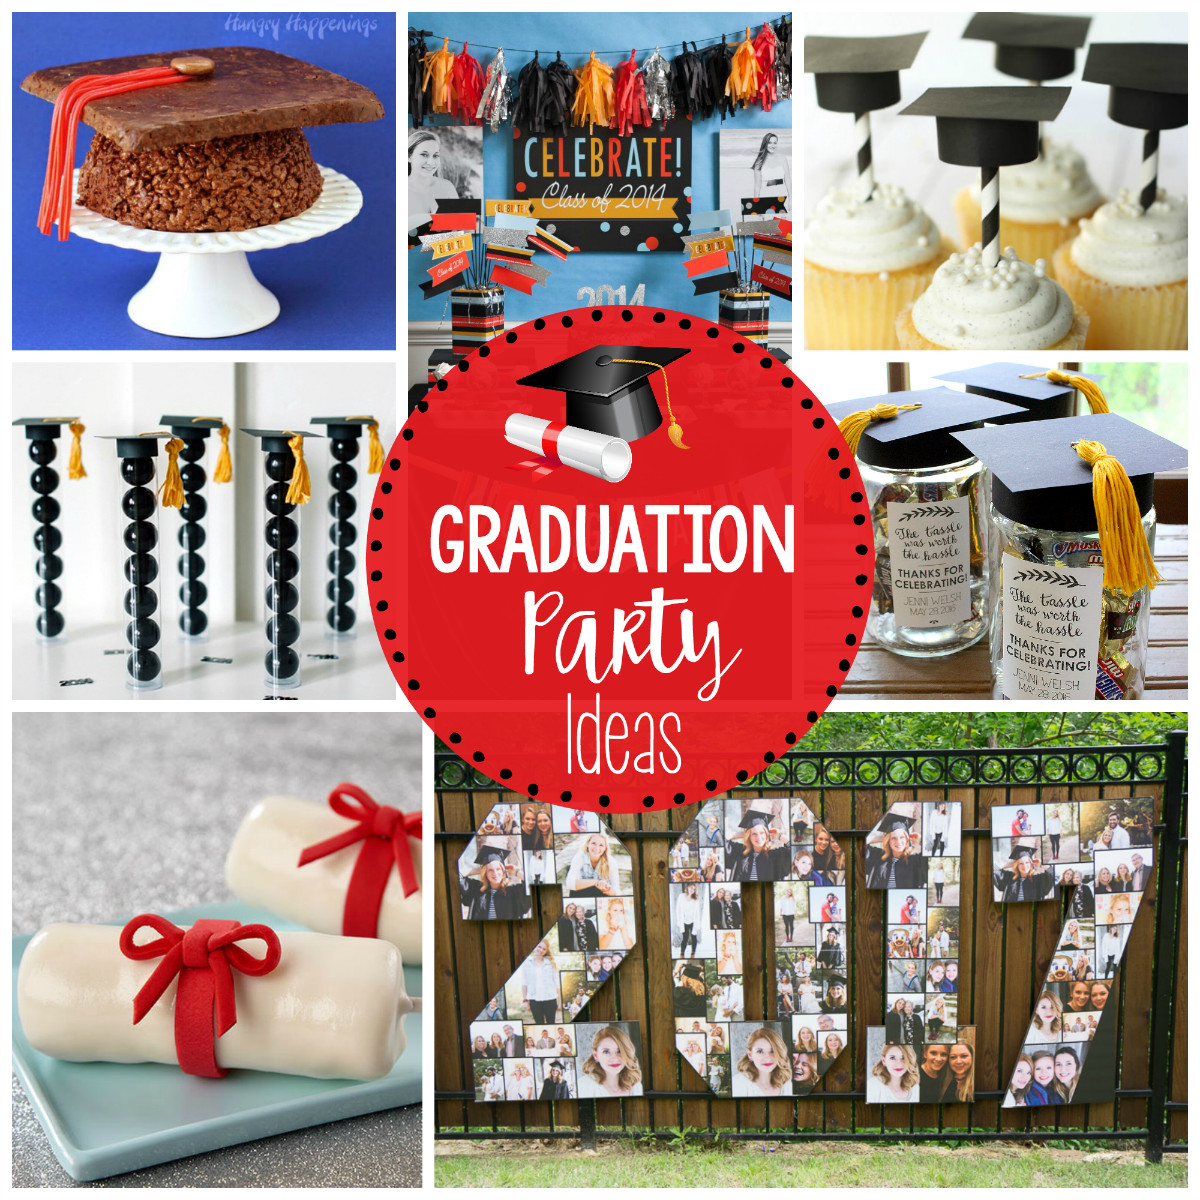 High School Graduation Party Ideas  25 Fun Graduation Party Ideas – Fun Squared